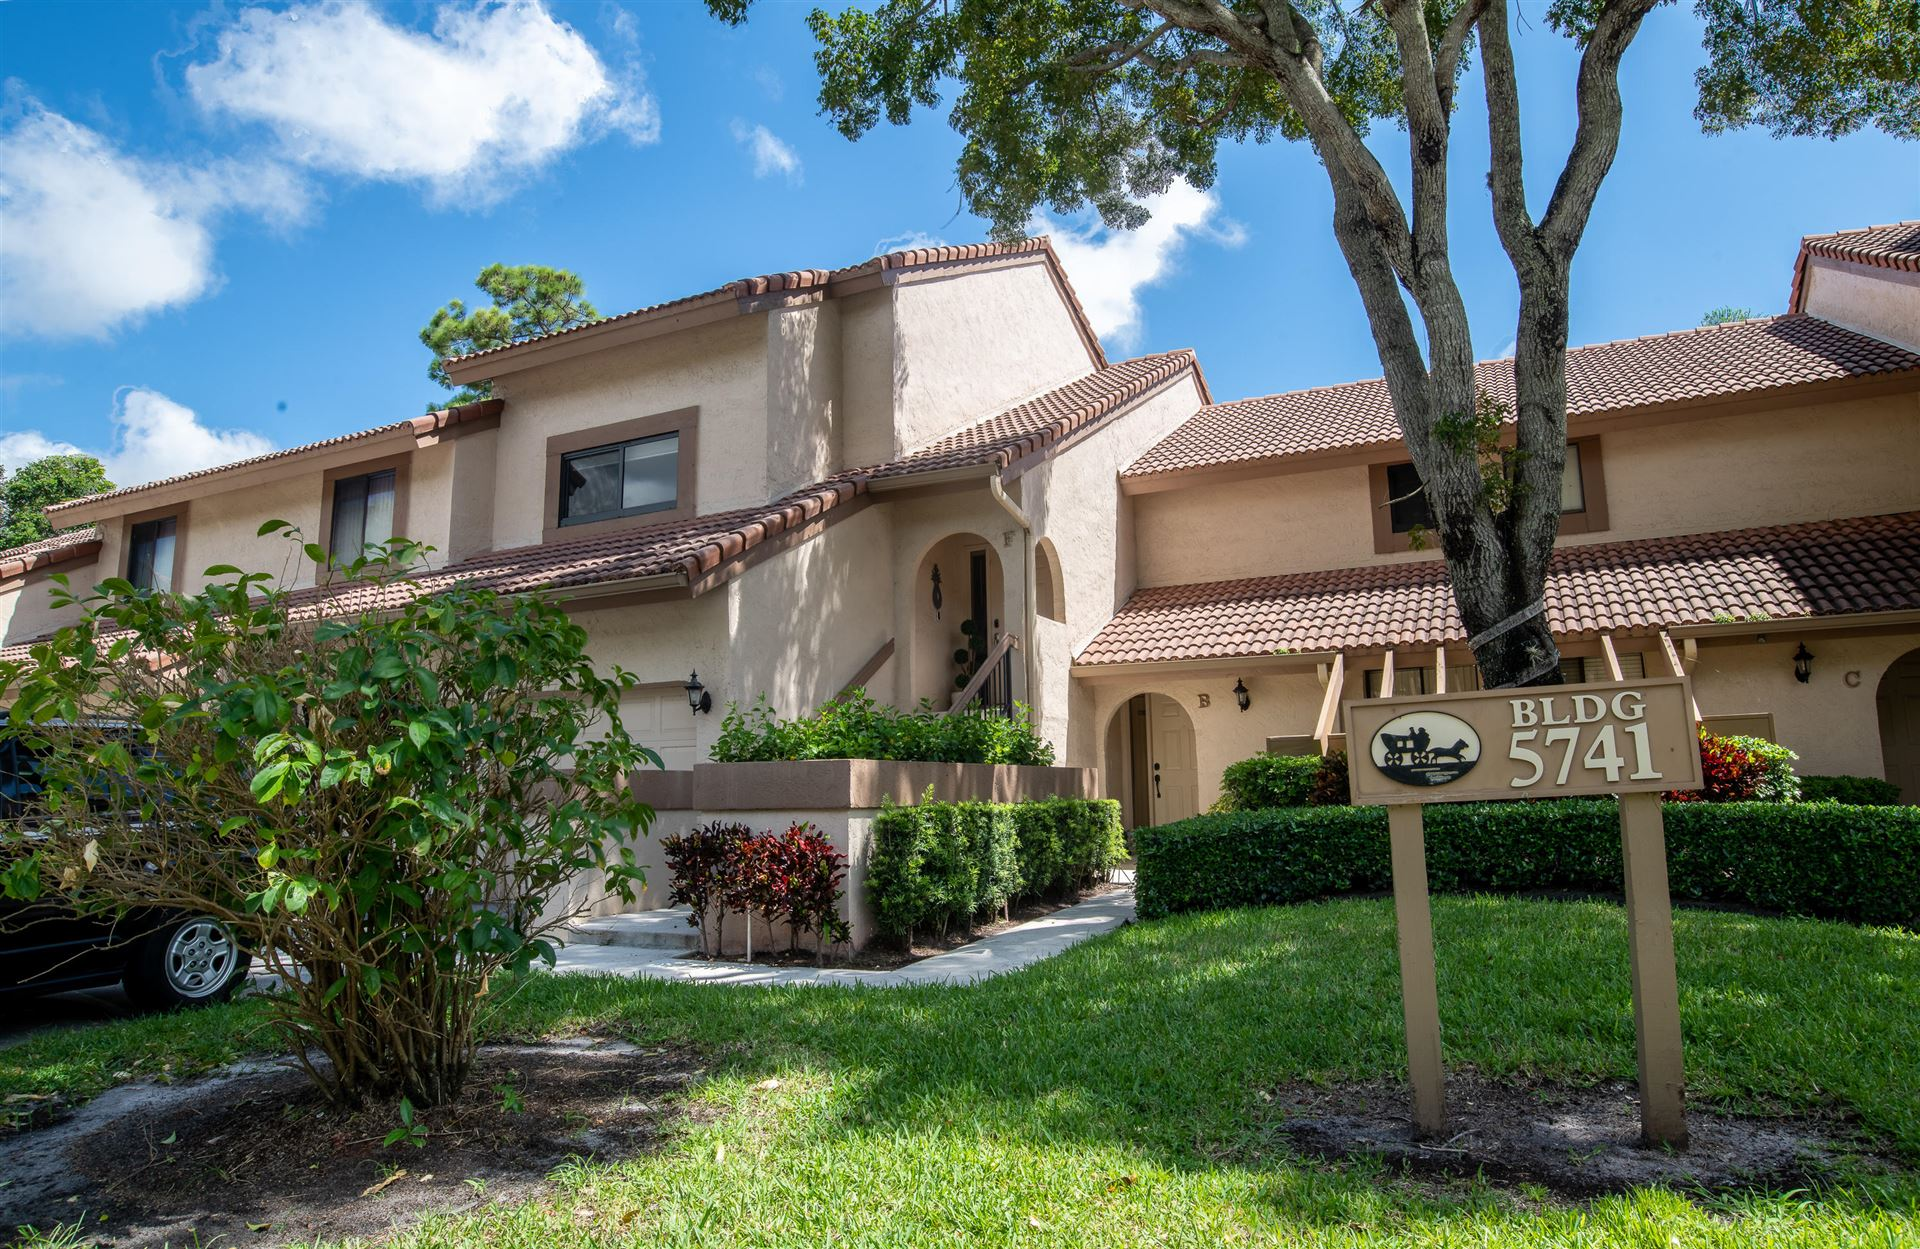 5741 Coach House Circle #F, Boca Raton, FL 33486 - #: RX-10646183